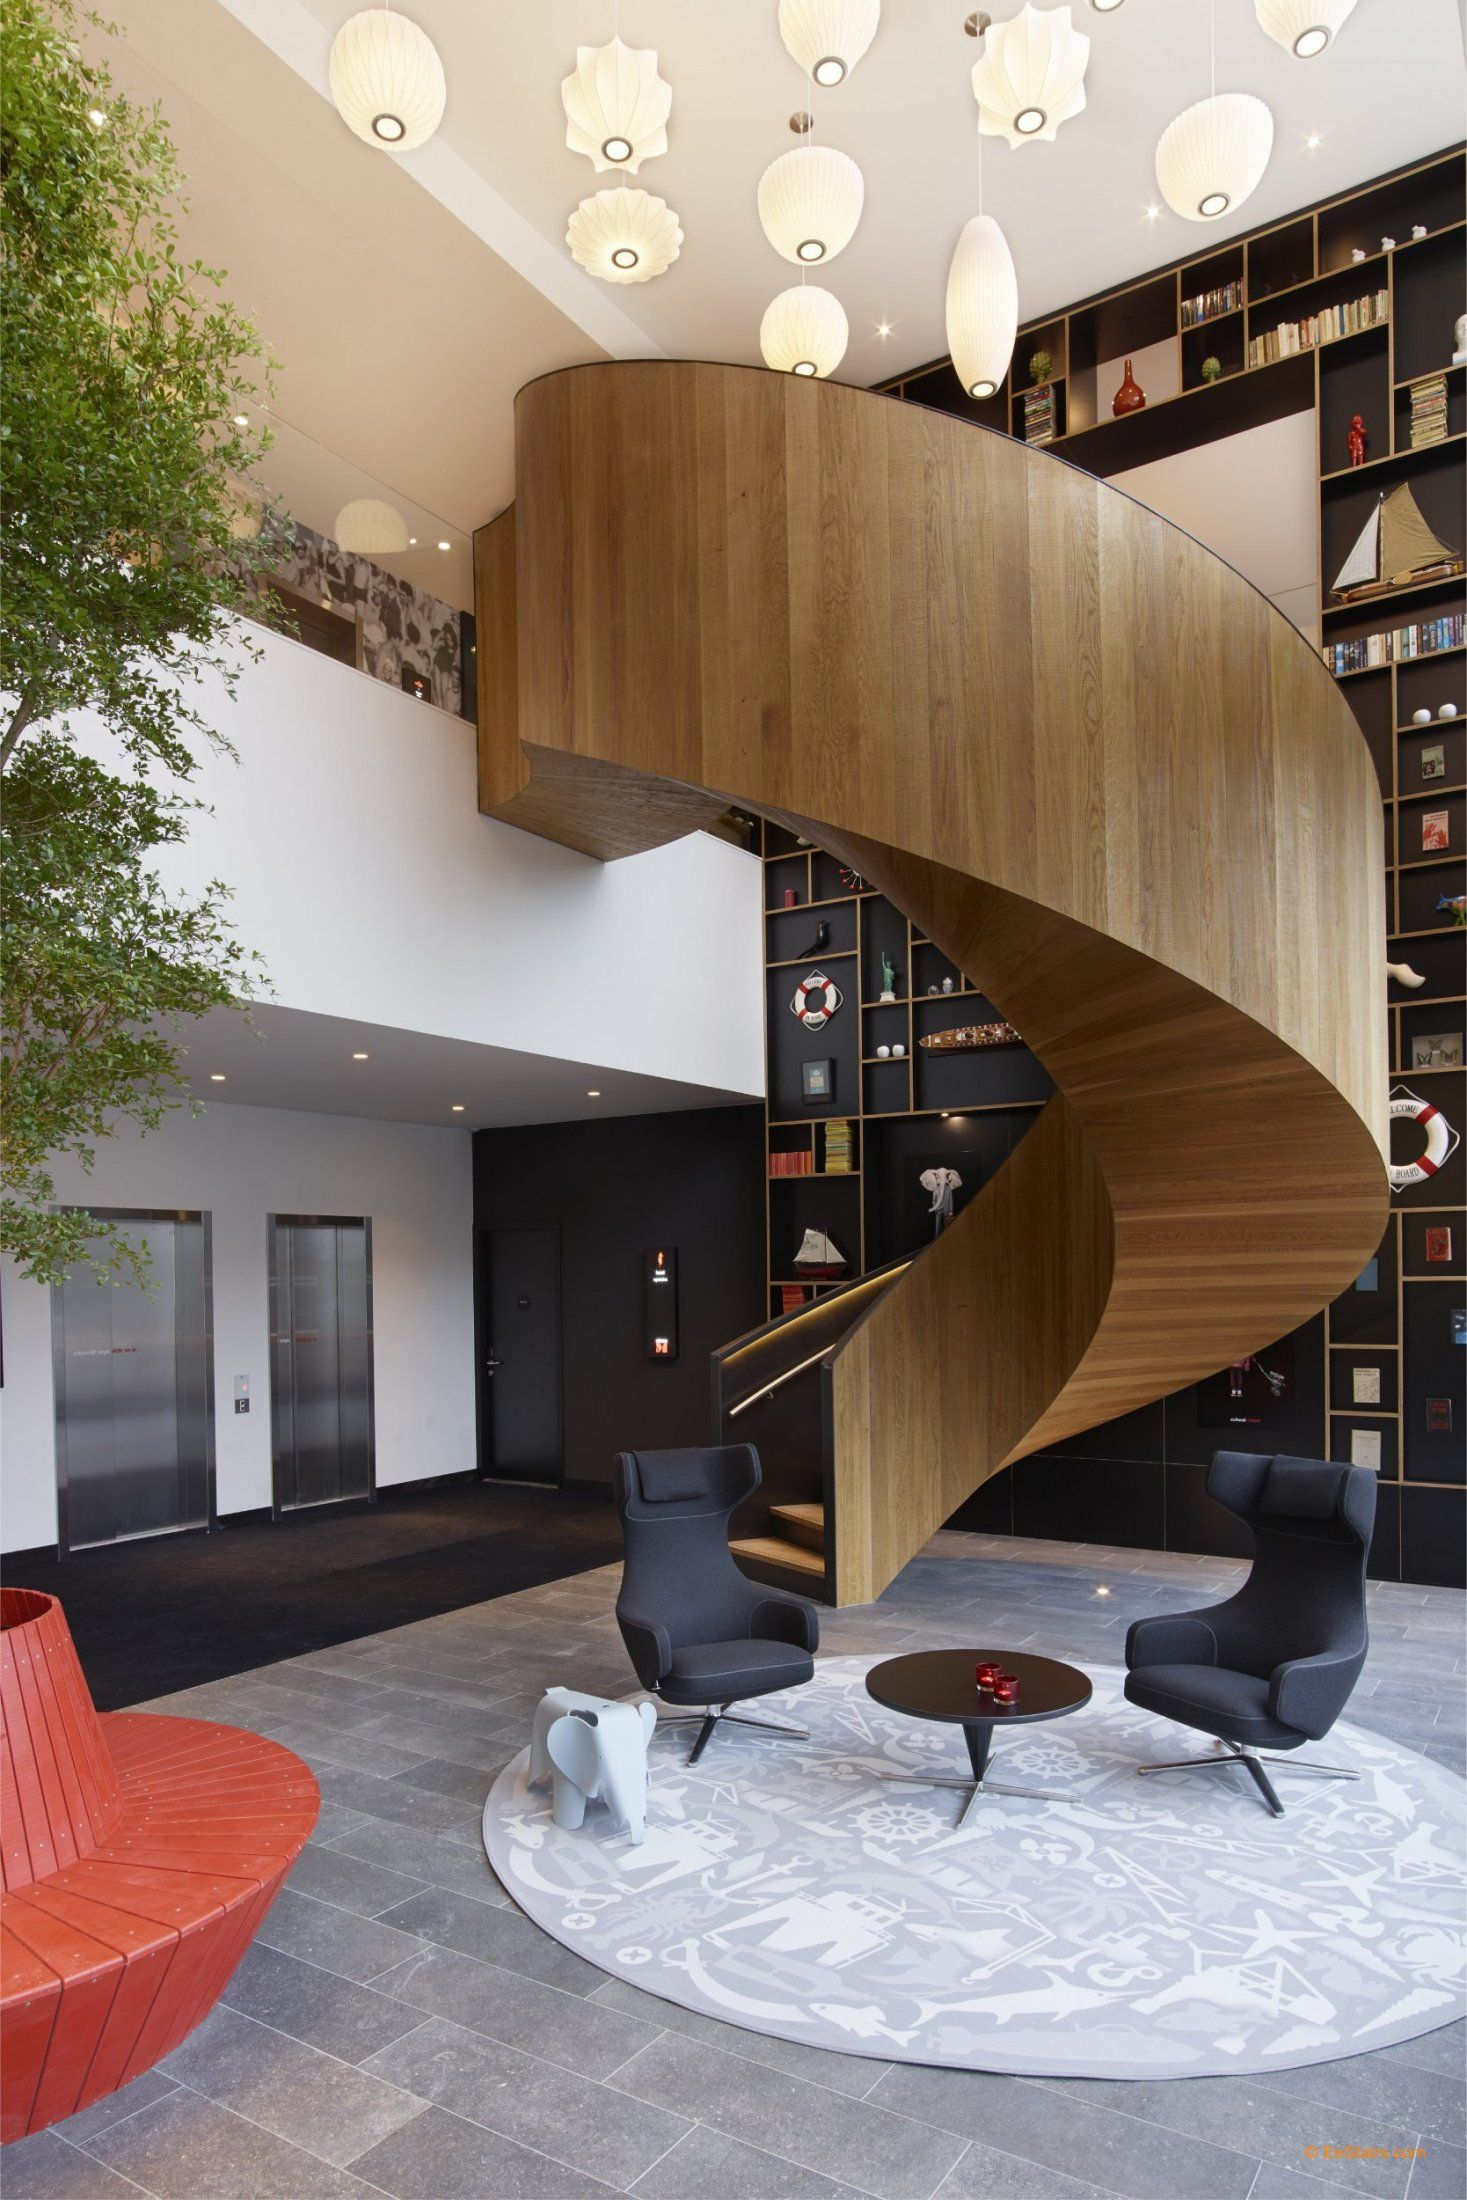 Escalier hélicoïdal en bois EeStairs | Staircase design ...